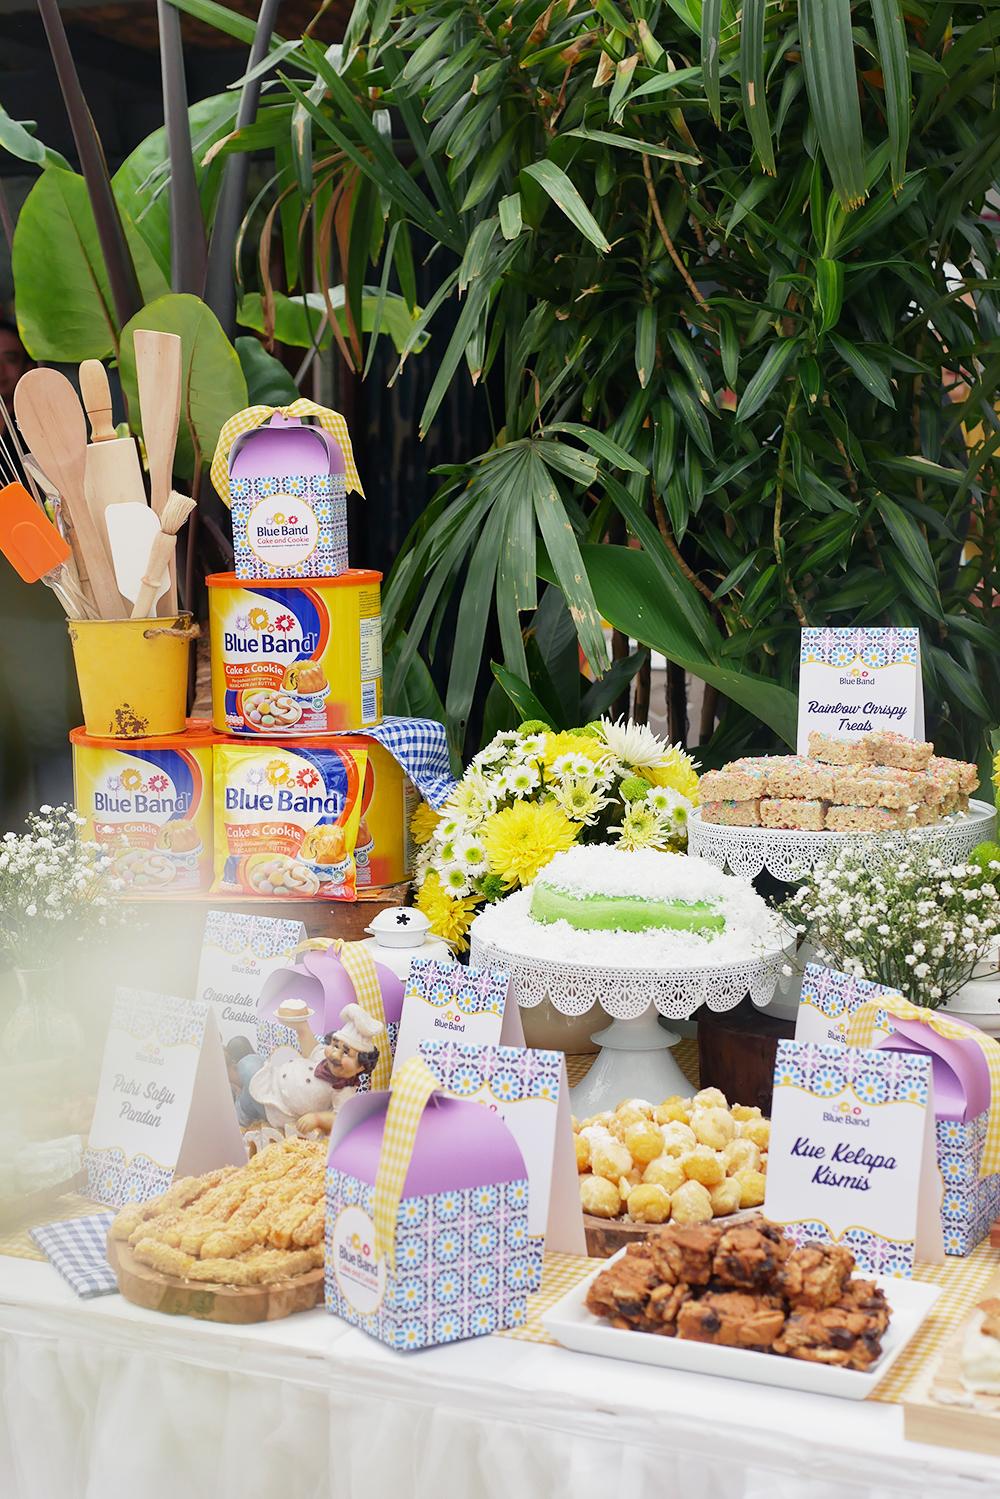 The glorious cookies and cakes display at the event. Di akhir acara, semua kue ini boleh dibawa pulang oleh semua peserta  workshop , lho!